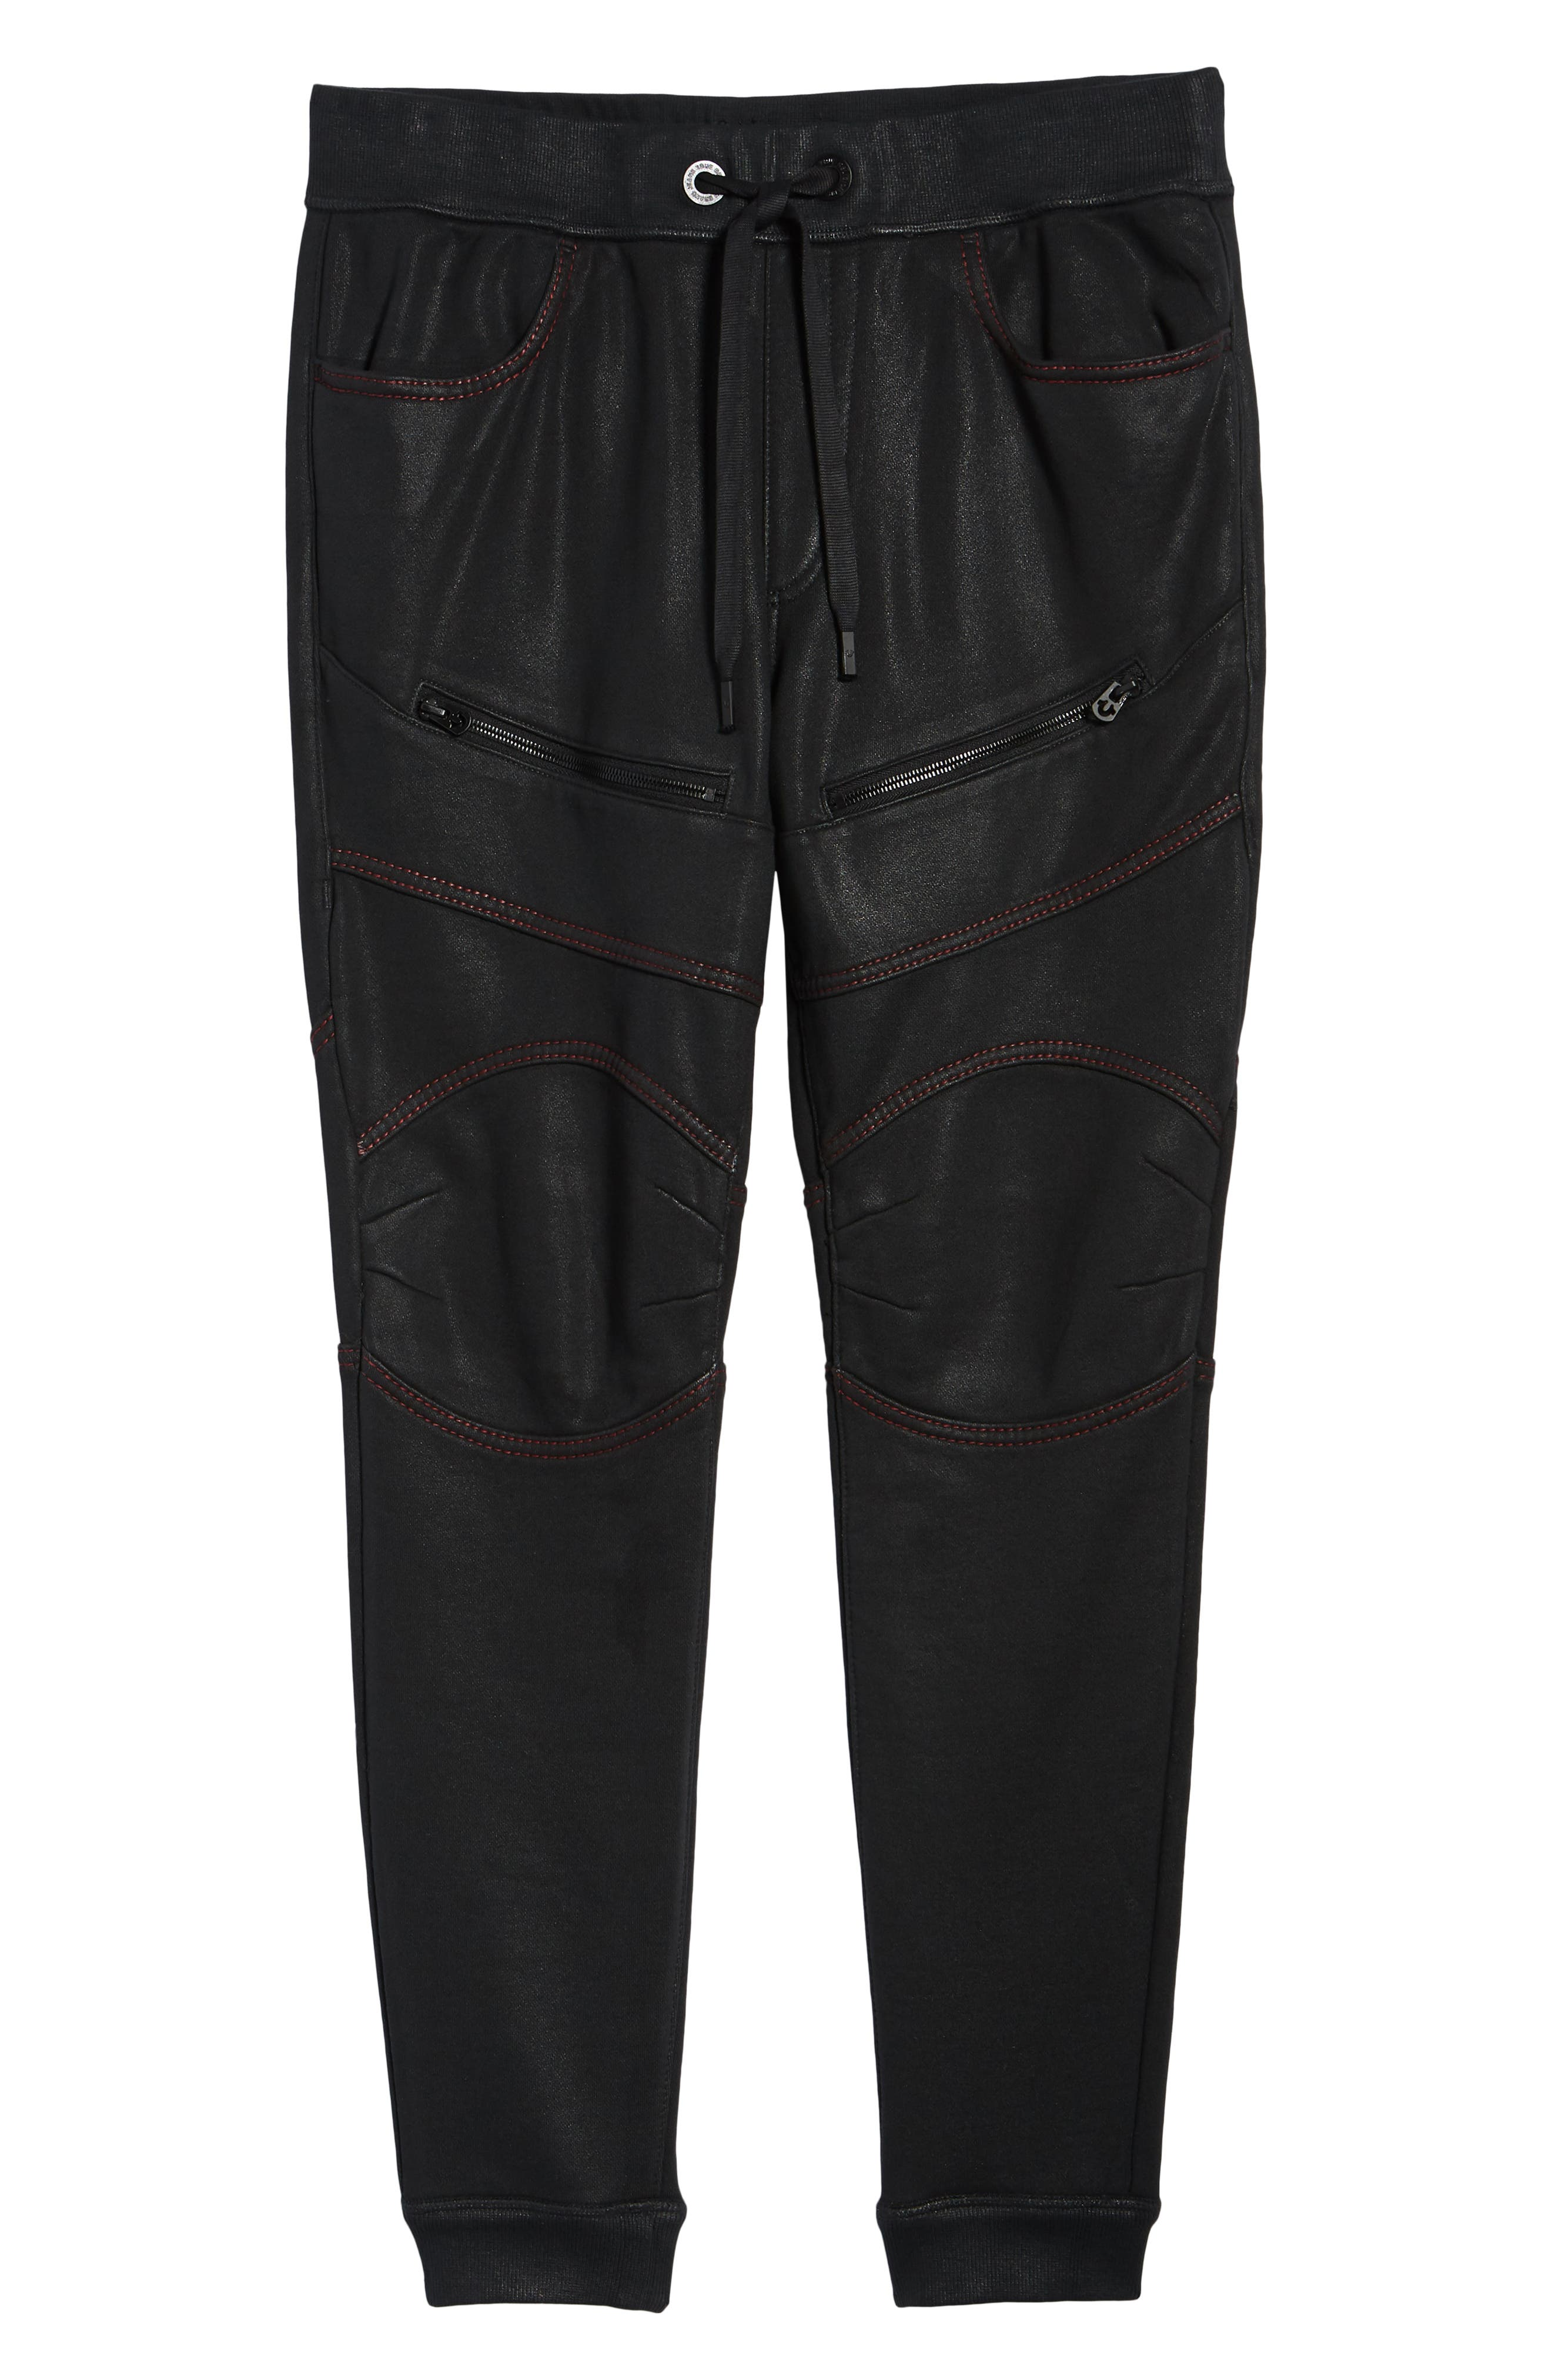 Moto Active Sweatpants,                             Alternate thumbnail 6, color,                             TRUE BLACK